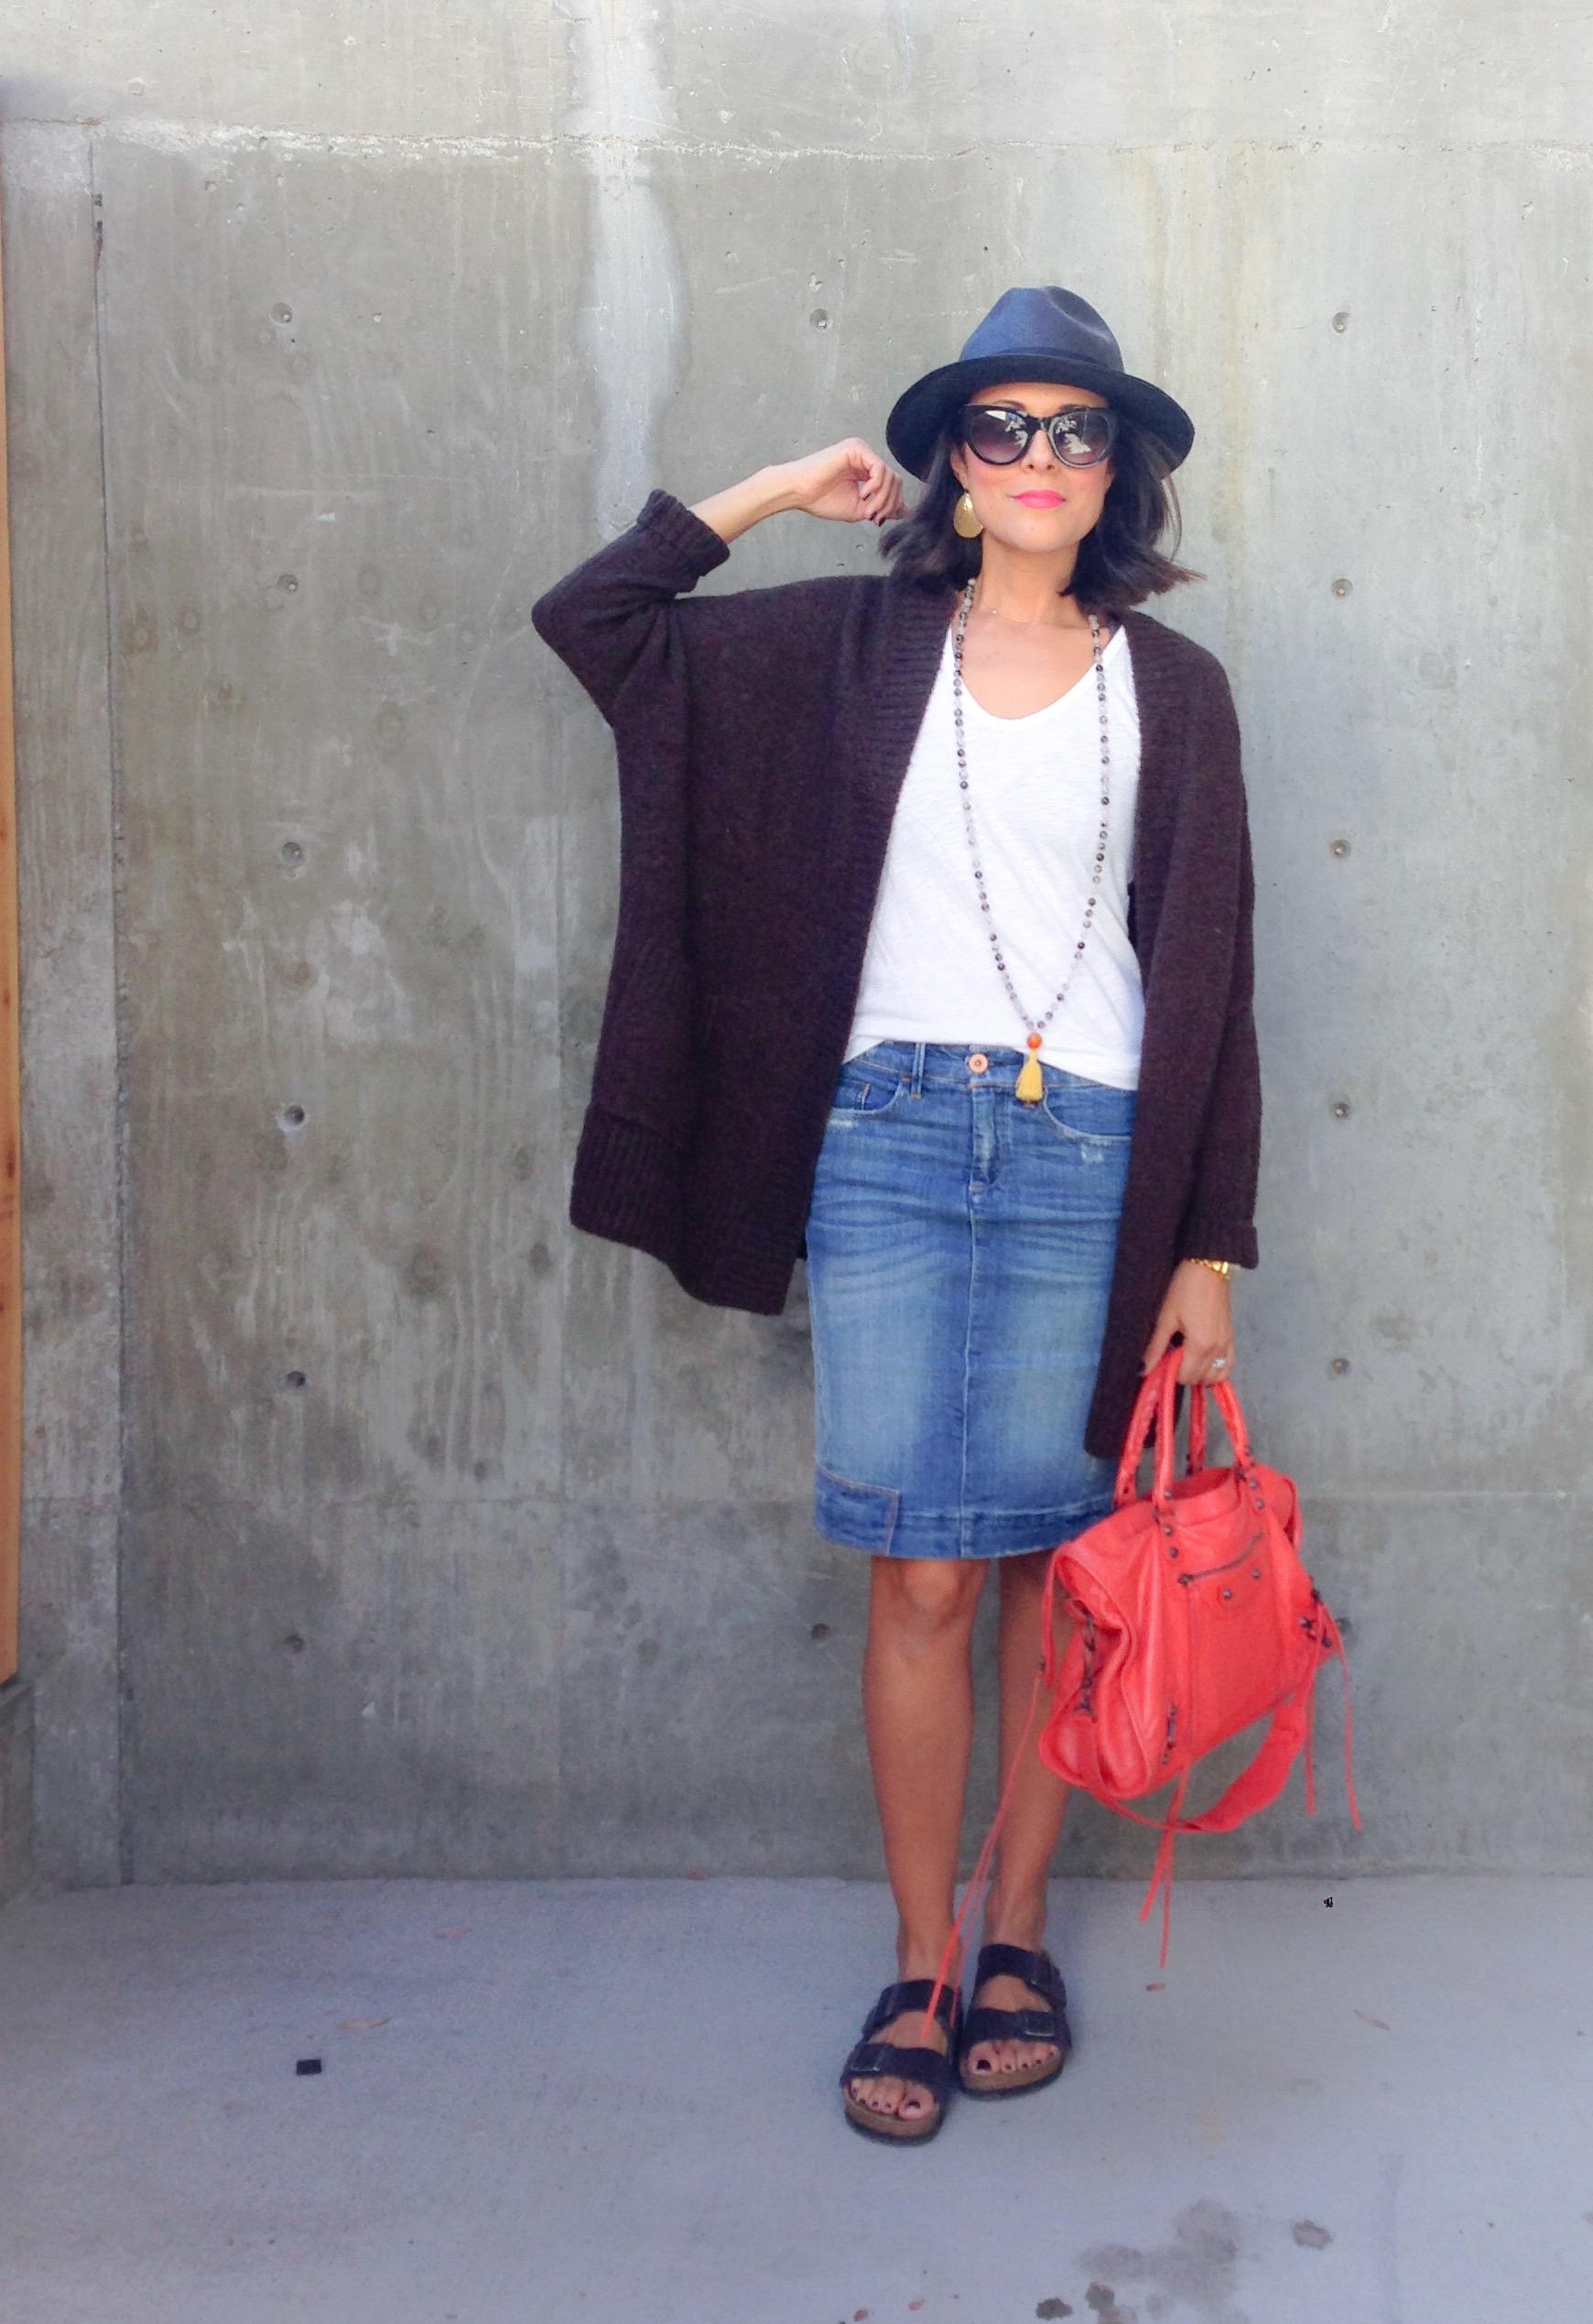 Sweater $59.90  |  Tank $24.95  |  Birkenstocks $129.95  |  Handbag  Mala Beads |  Hat similar here $65  |  Sunglasses $125